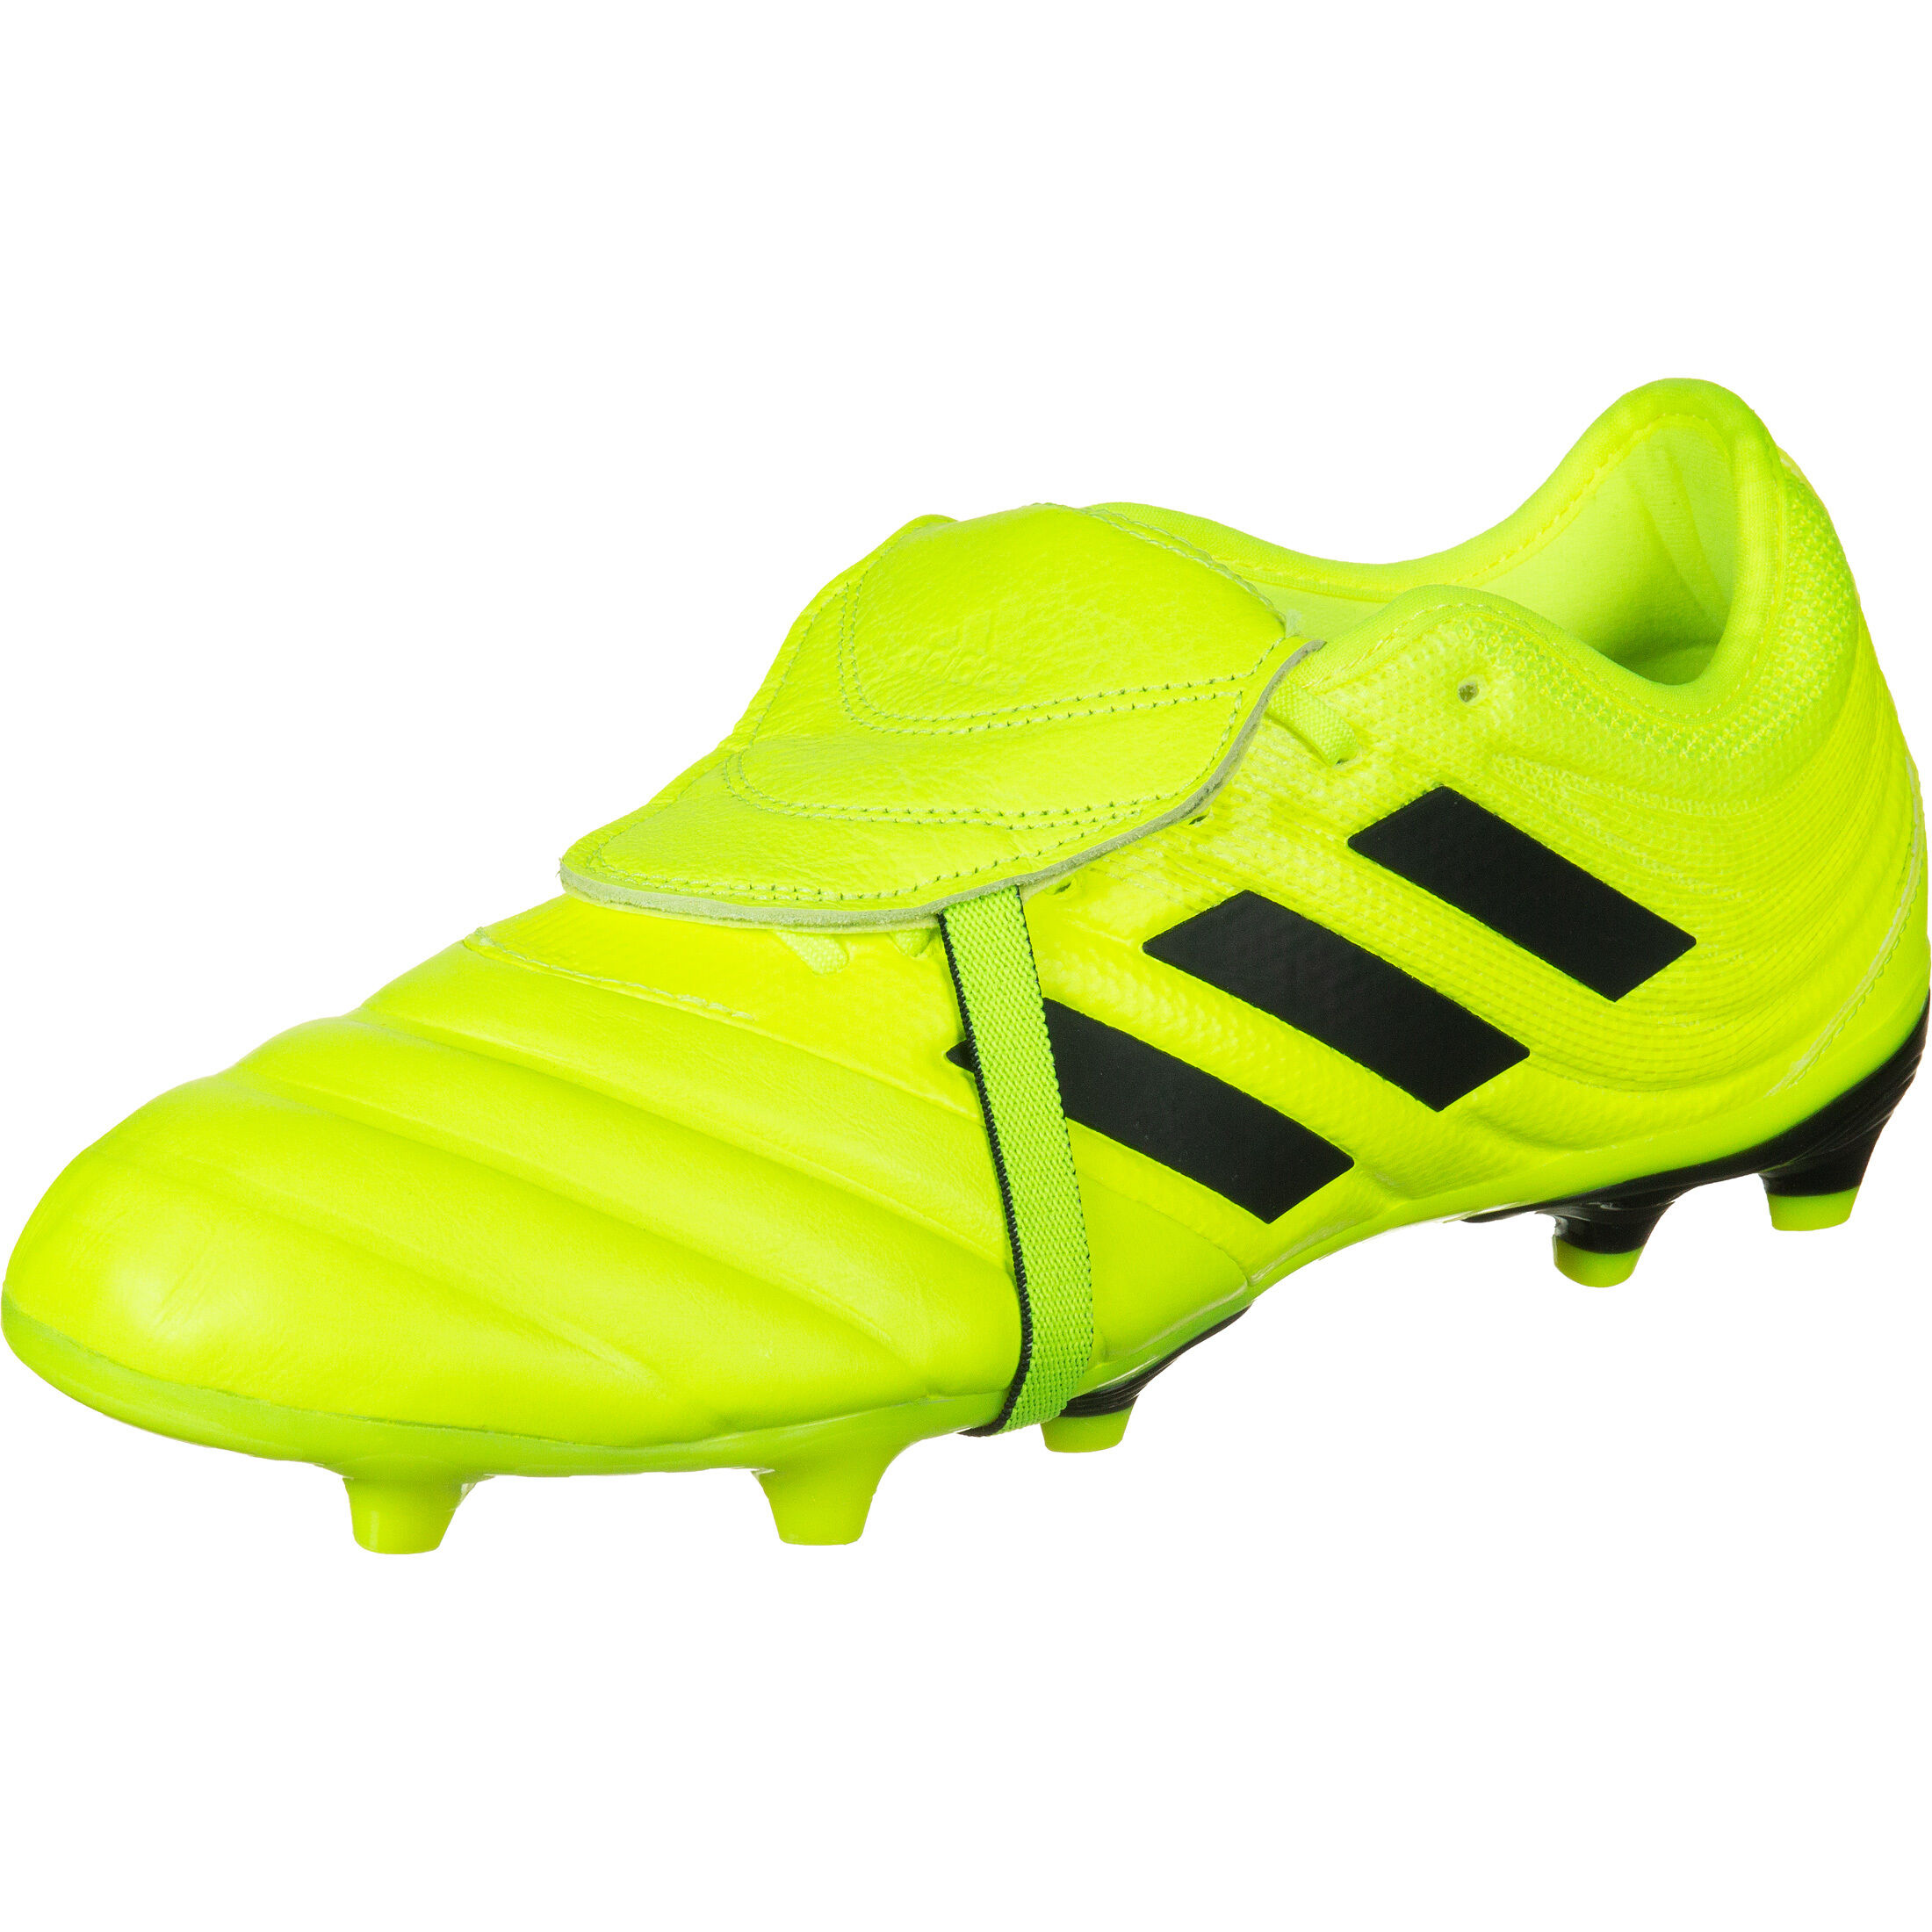 adidas Copa 19.1 FG Fussballschuh schwarzrot   soccercity